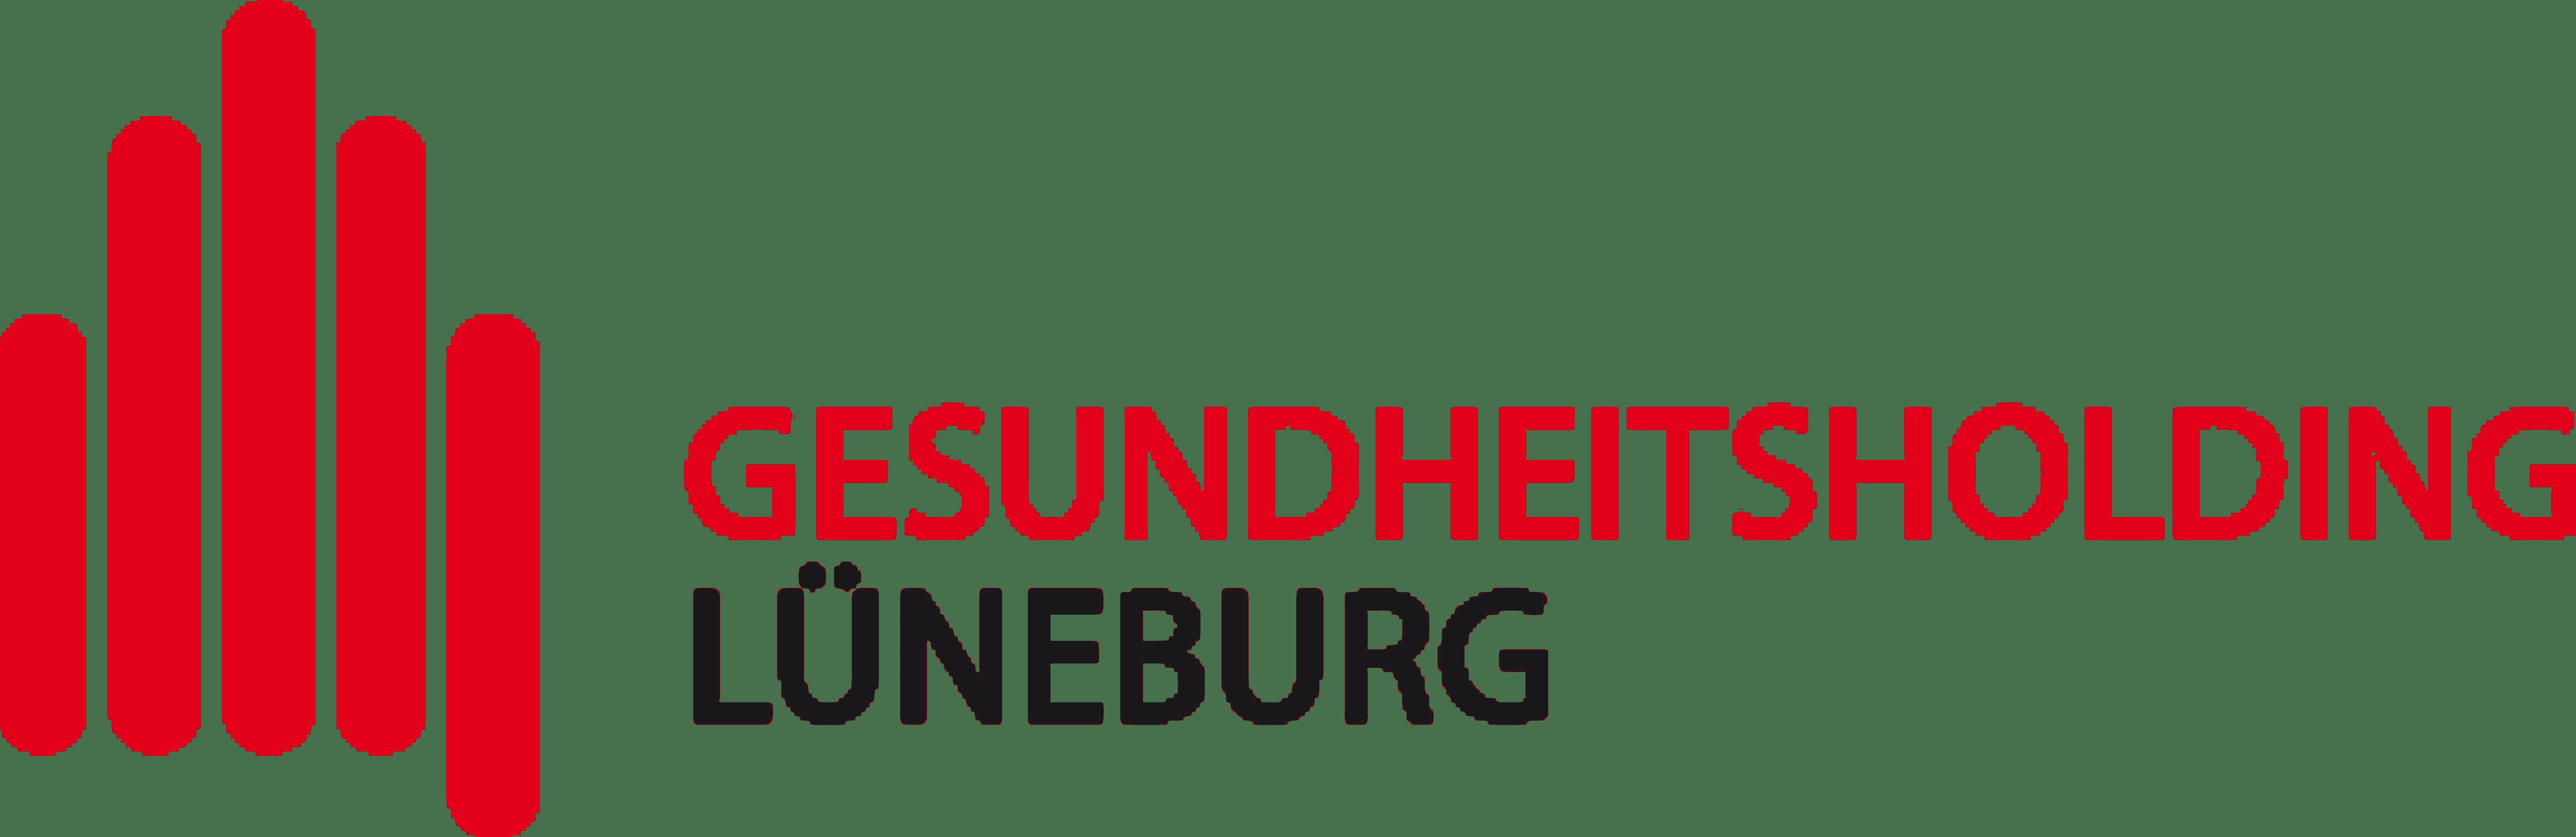 logo Gesundheitsholding Lüneburg